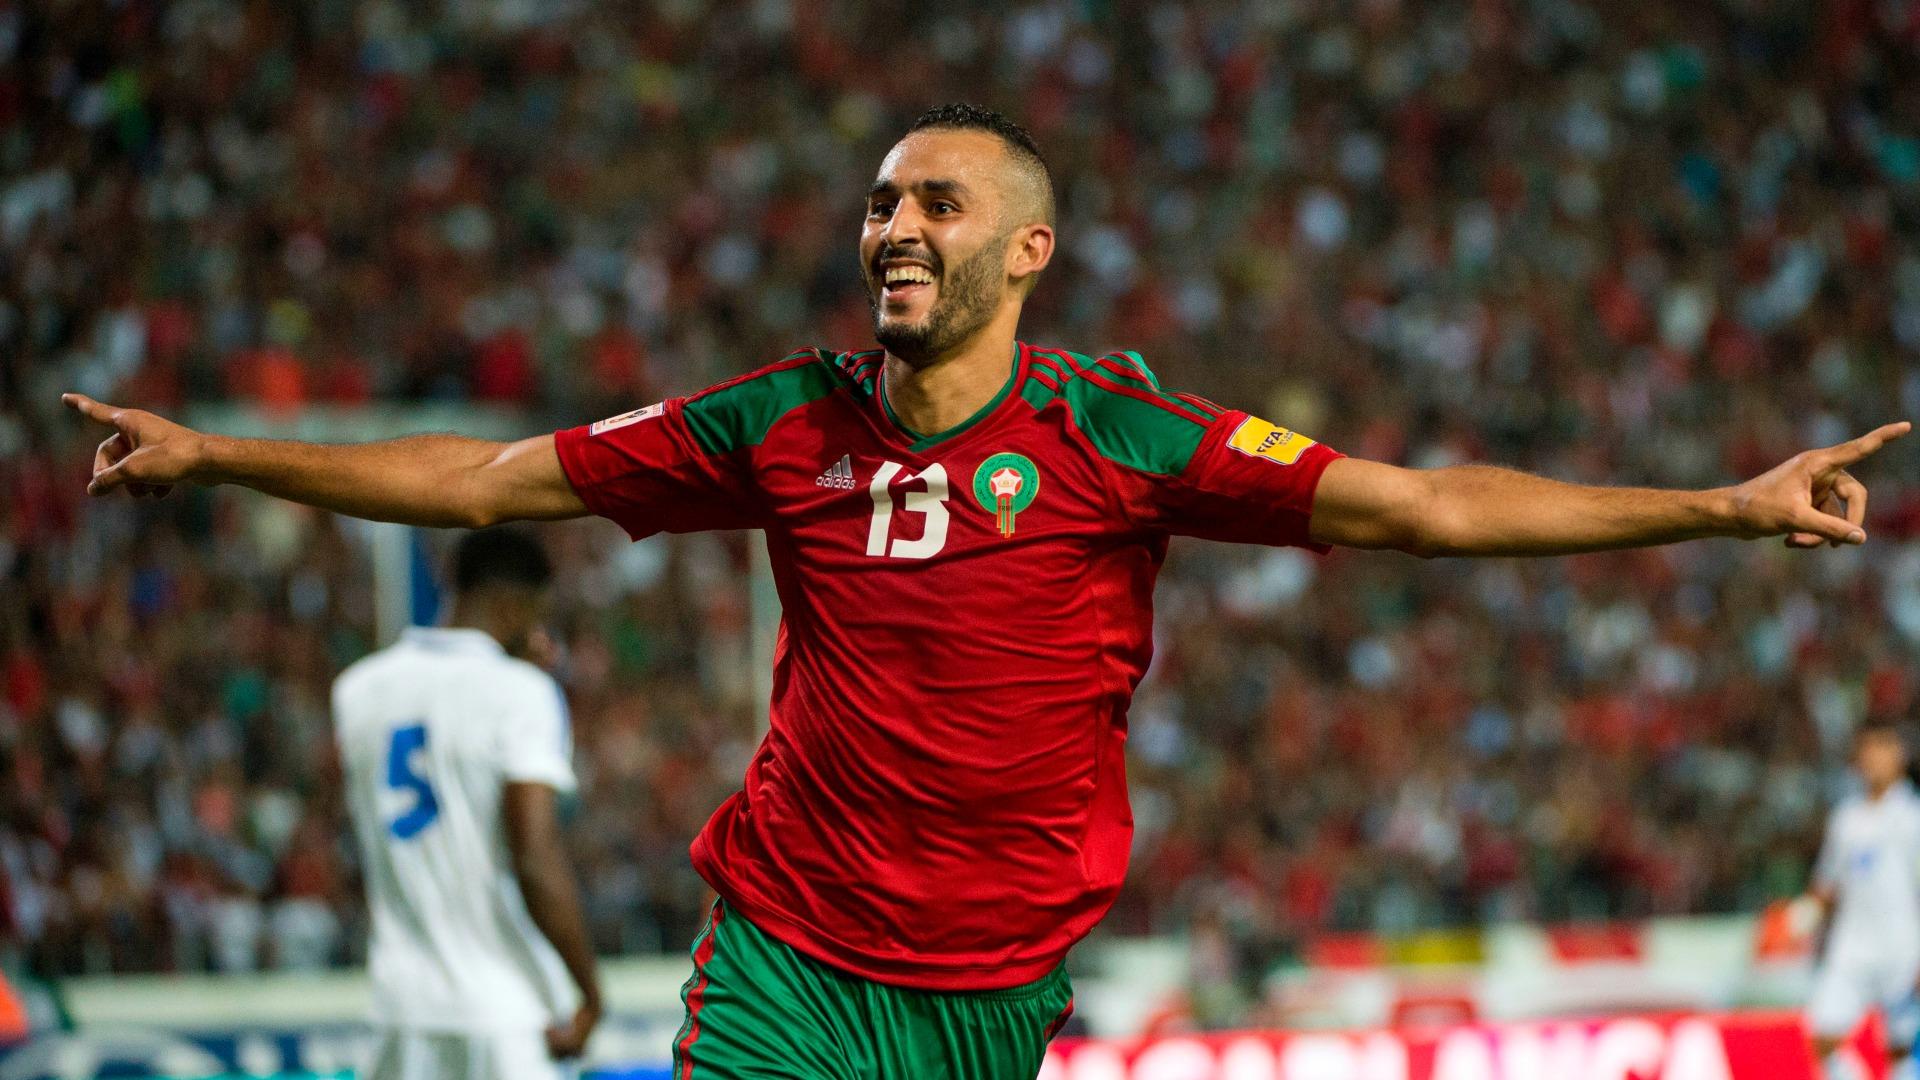 Boutaib Khalid Marruecos